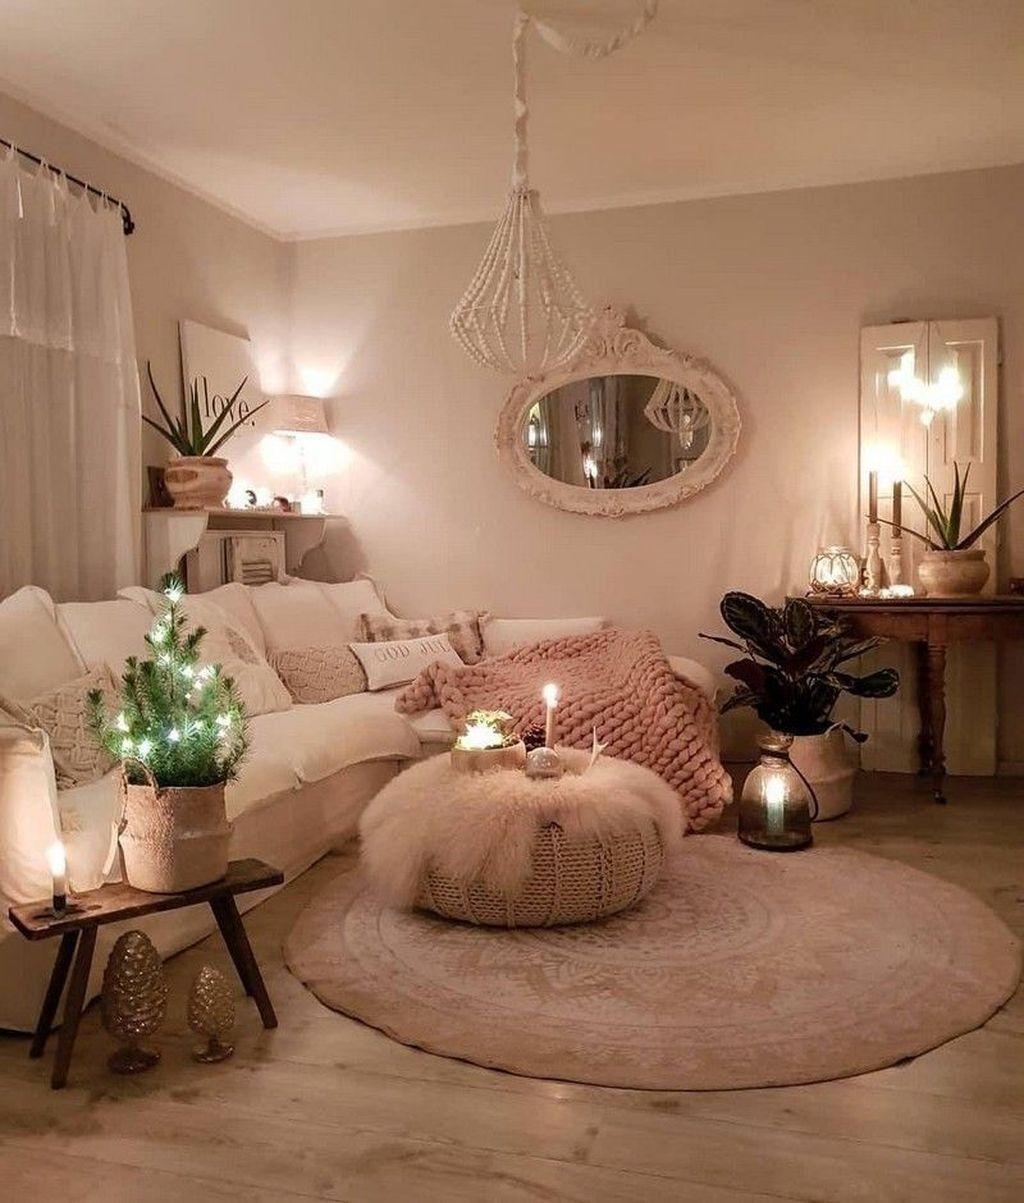 43 Awesome Bohemian Living Room Decor Ideas – HOOMDSGN